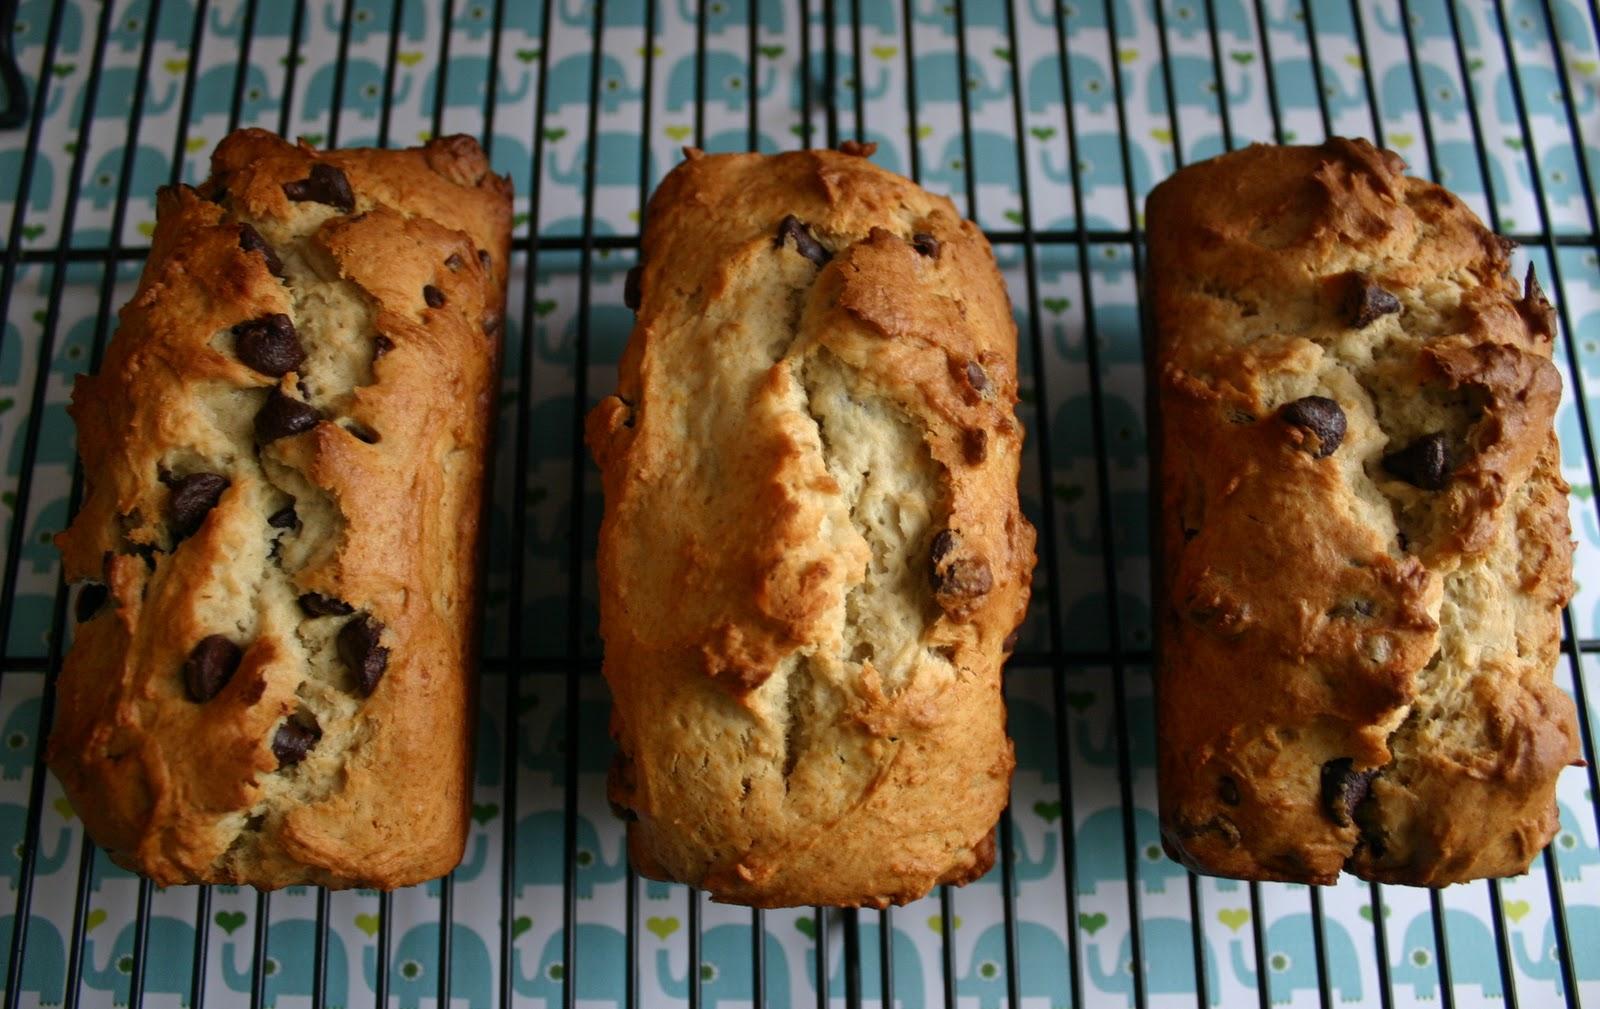 My Retro Kitchen: Eggless Chocolate Chip Banana Bread